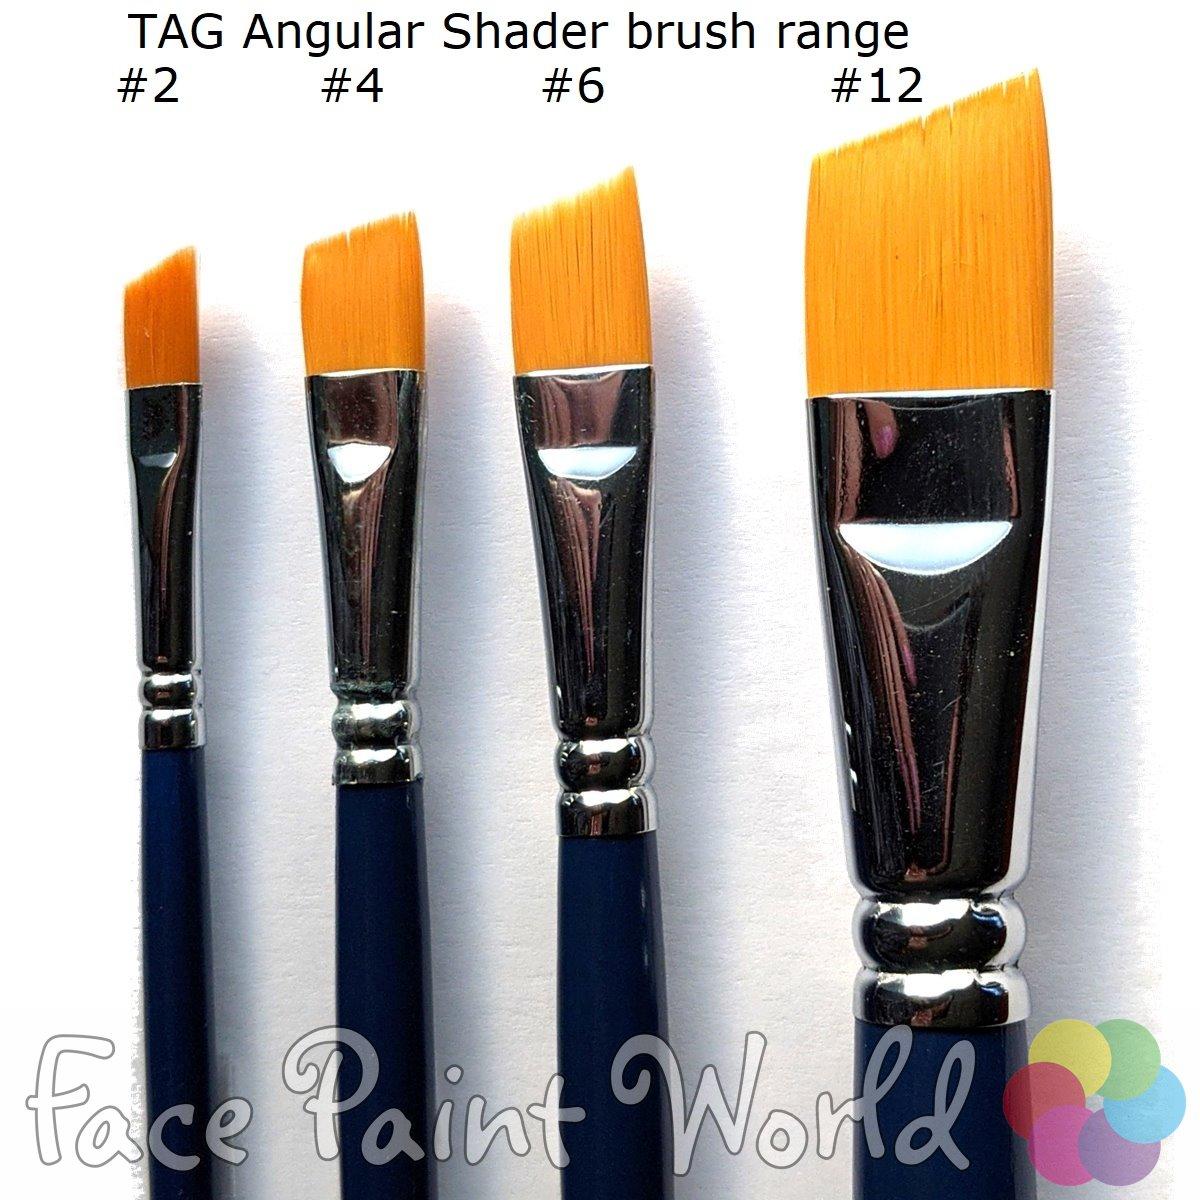 TAG Angular Shader Brush #12 : 3/4 inch